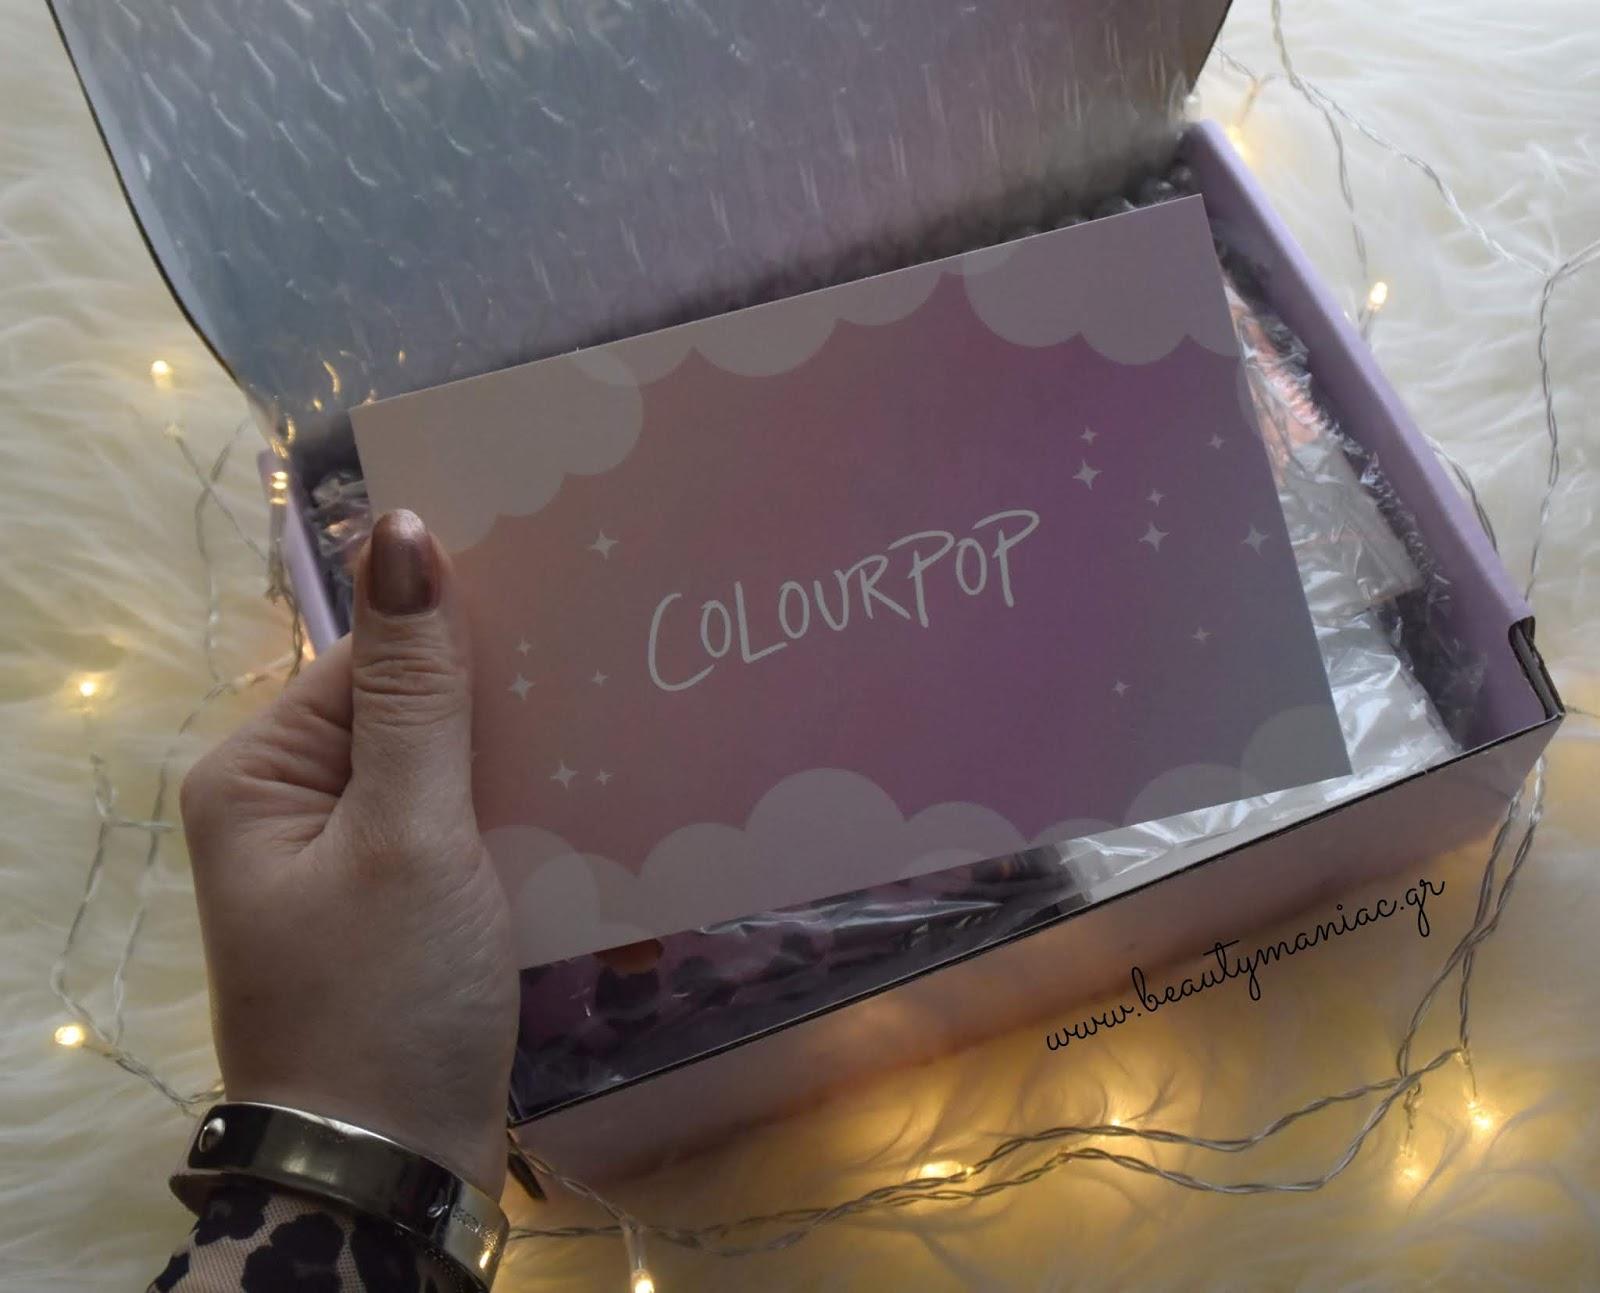 5efd40c7feb Μέσα στο 2018 δοκίμασα πάρα πολλά, καινούργια προϊόντα μακιγιάζ και η  Colourpop μου απέδειξε ότι η ποιότητα μπορεί να έρχεται και σε προσιτή τιμή.